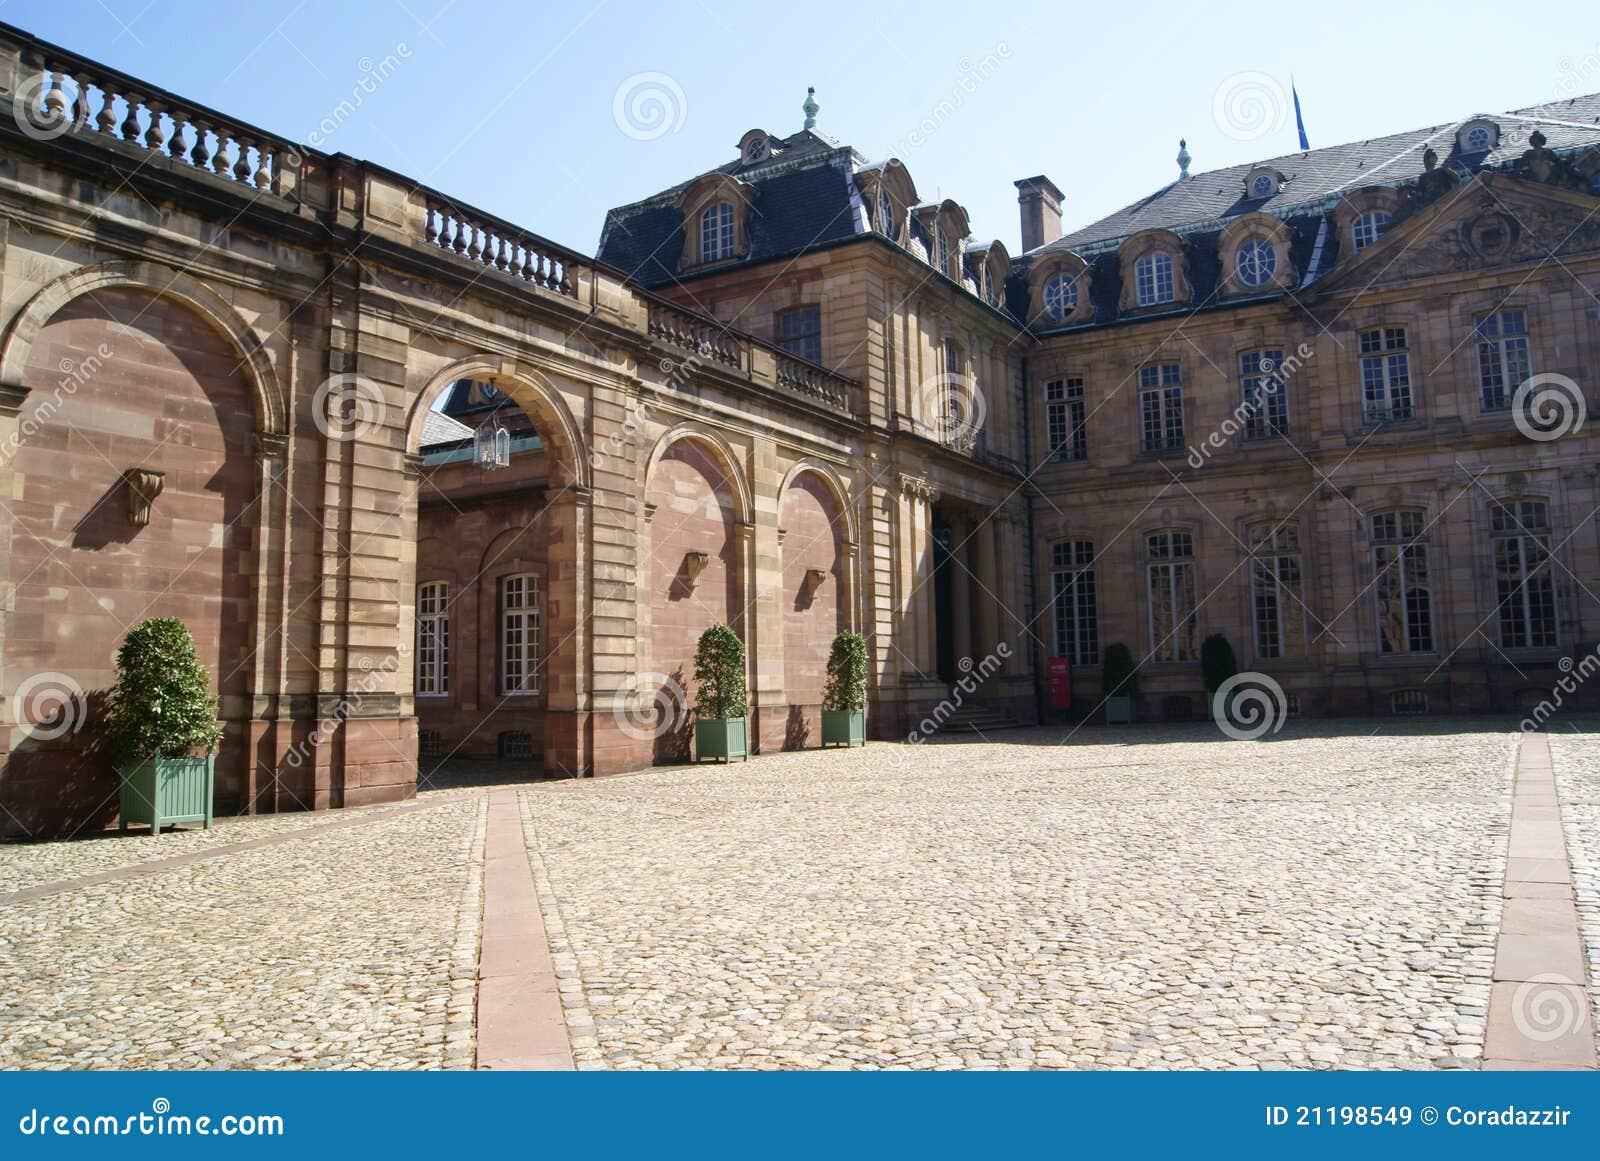 Historical Strasbourg